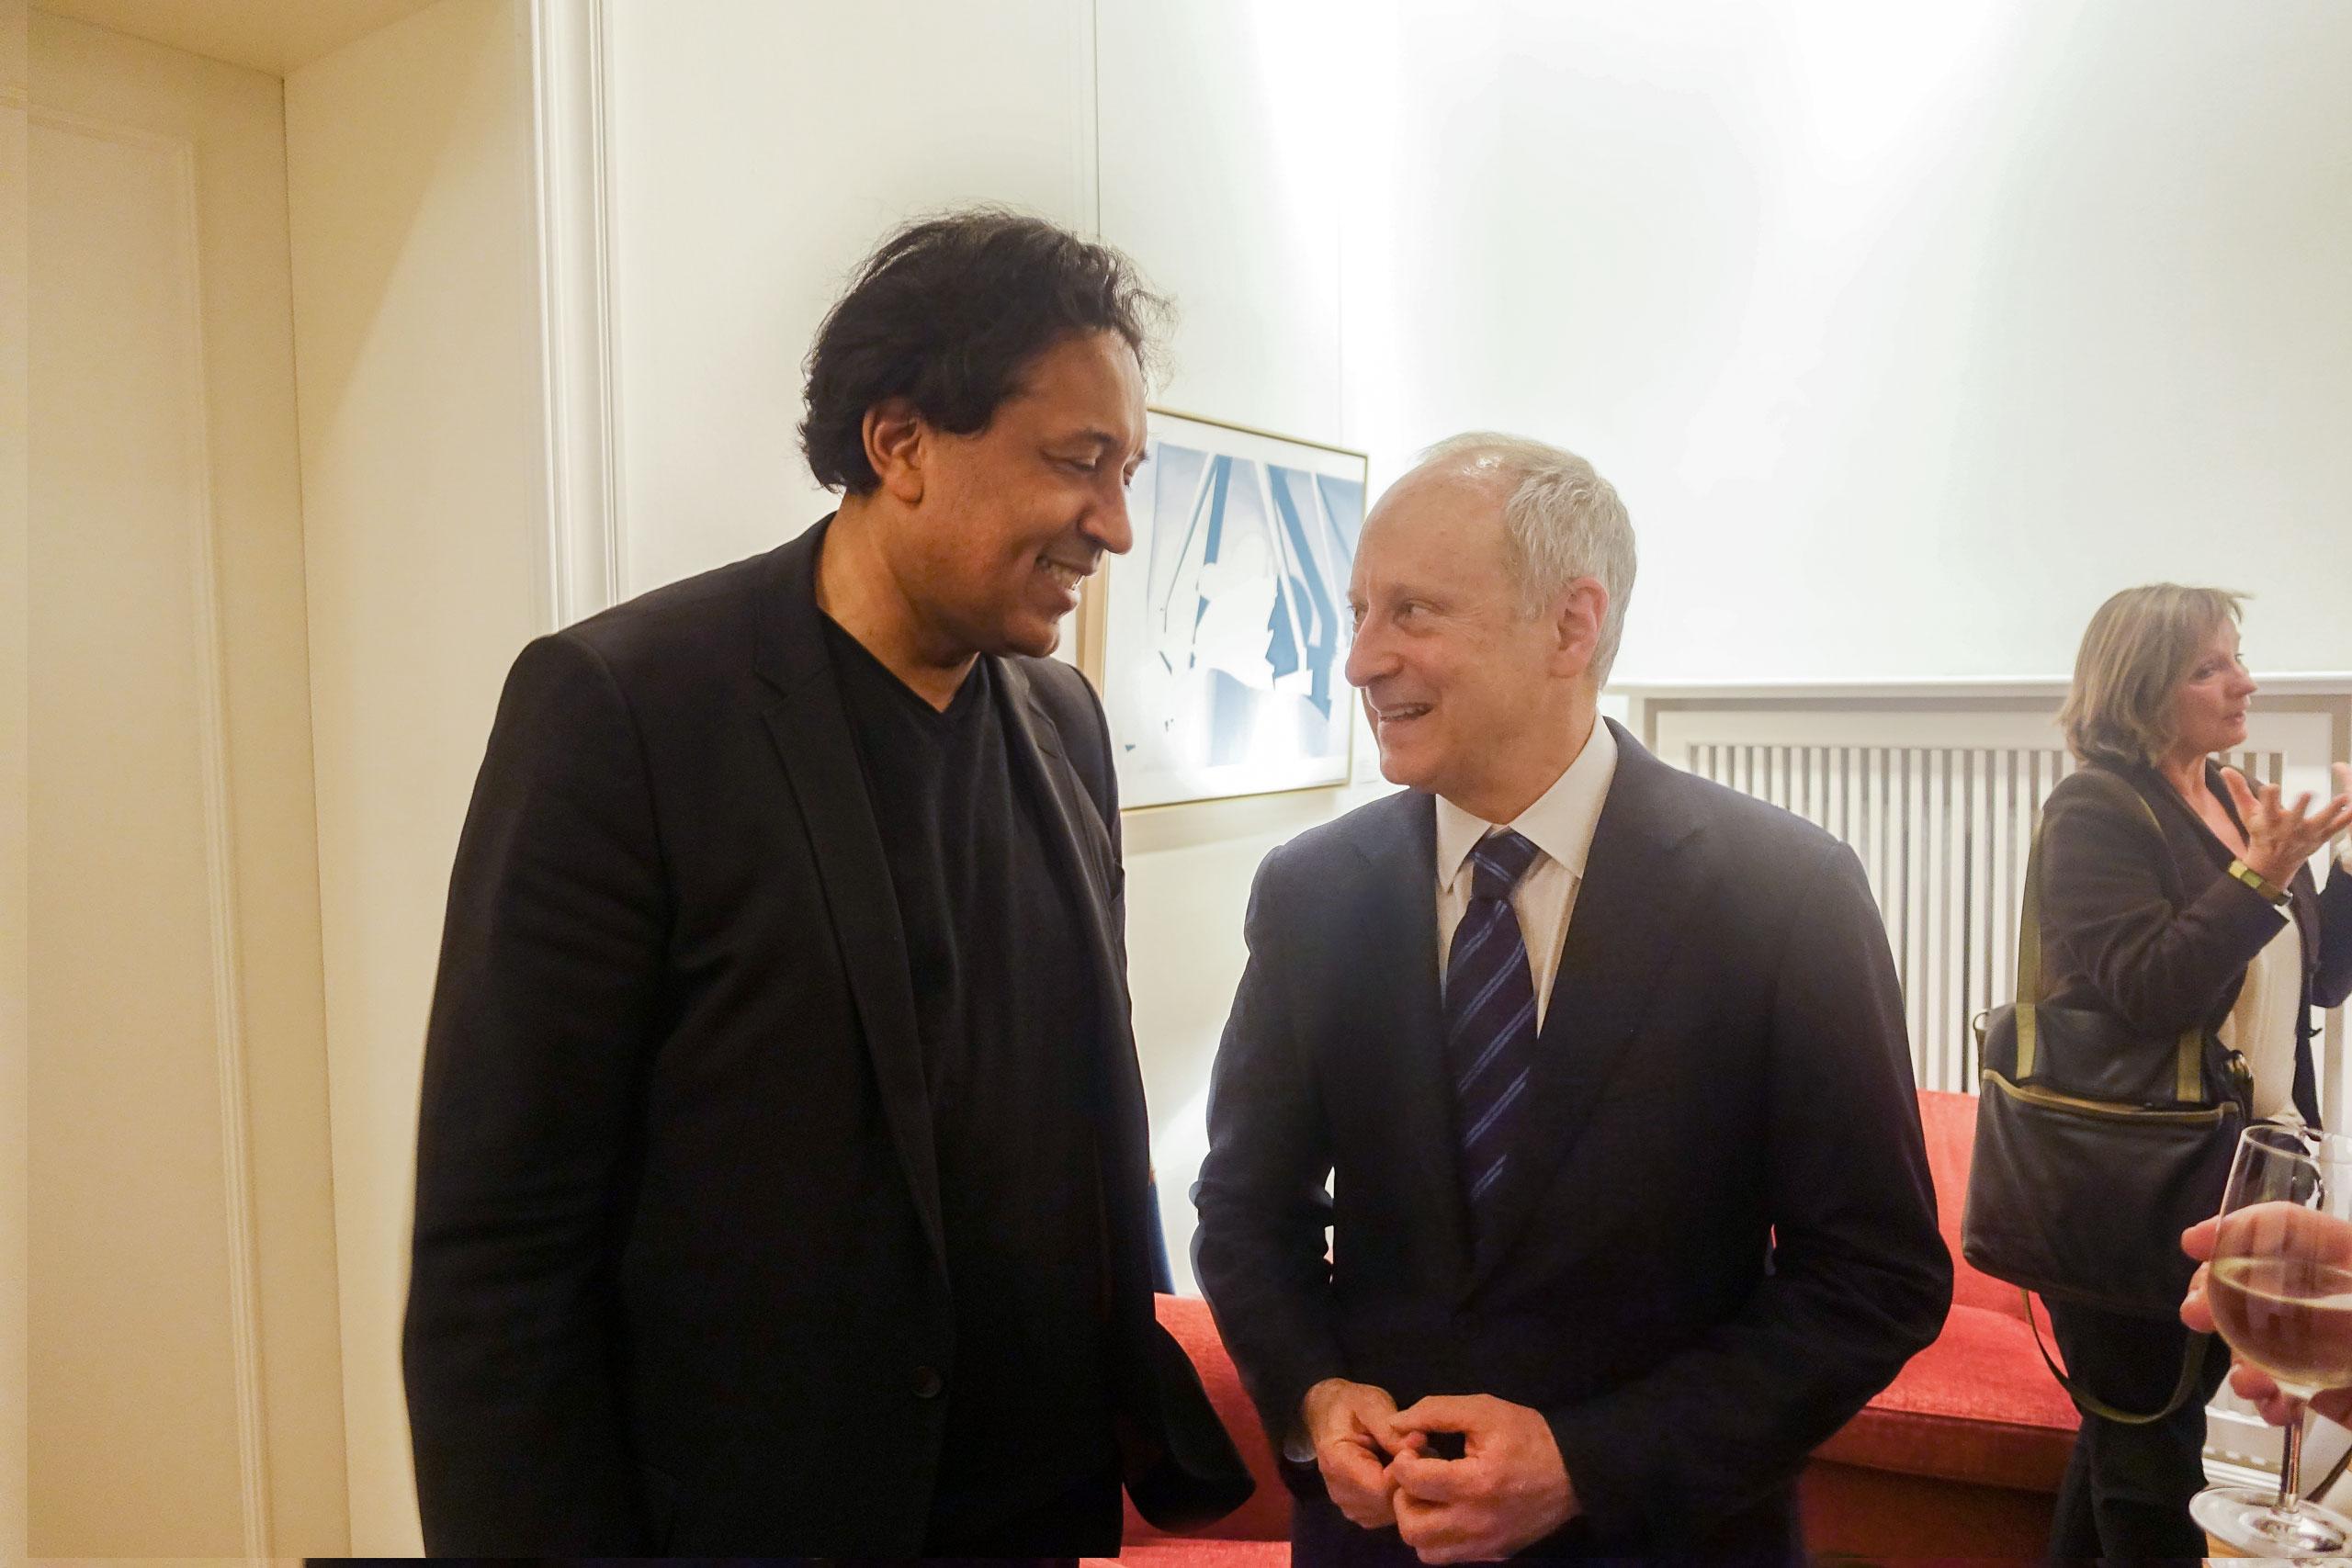 Michael Sandel & Cherno Jobatey